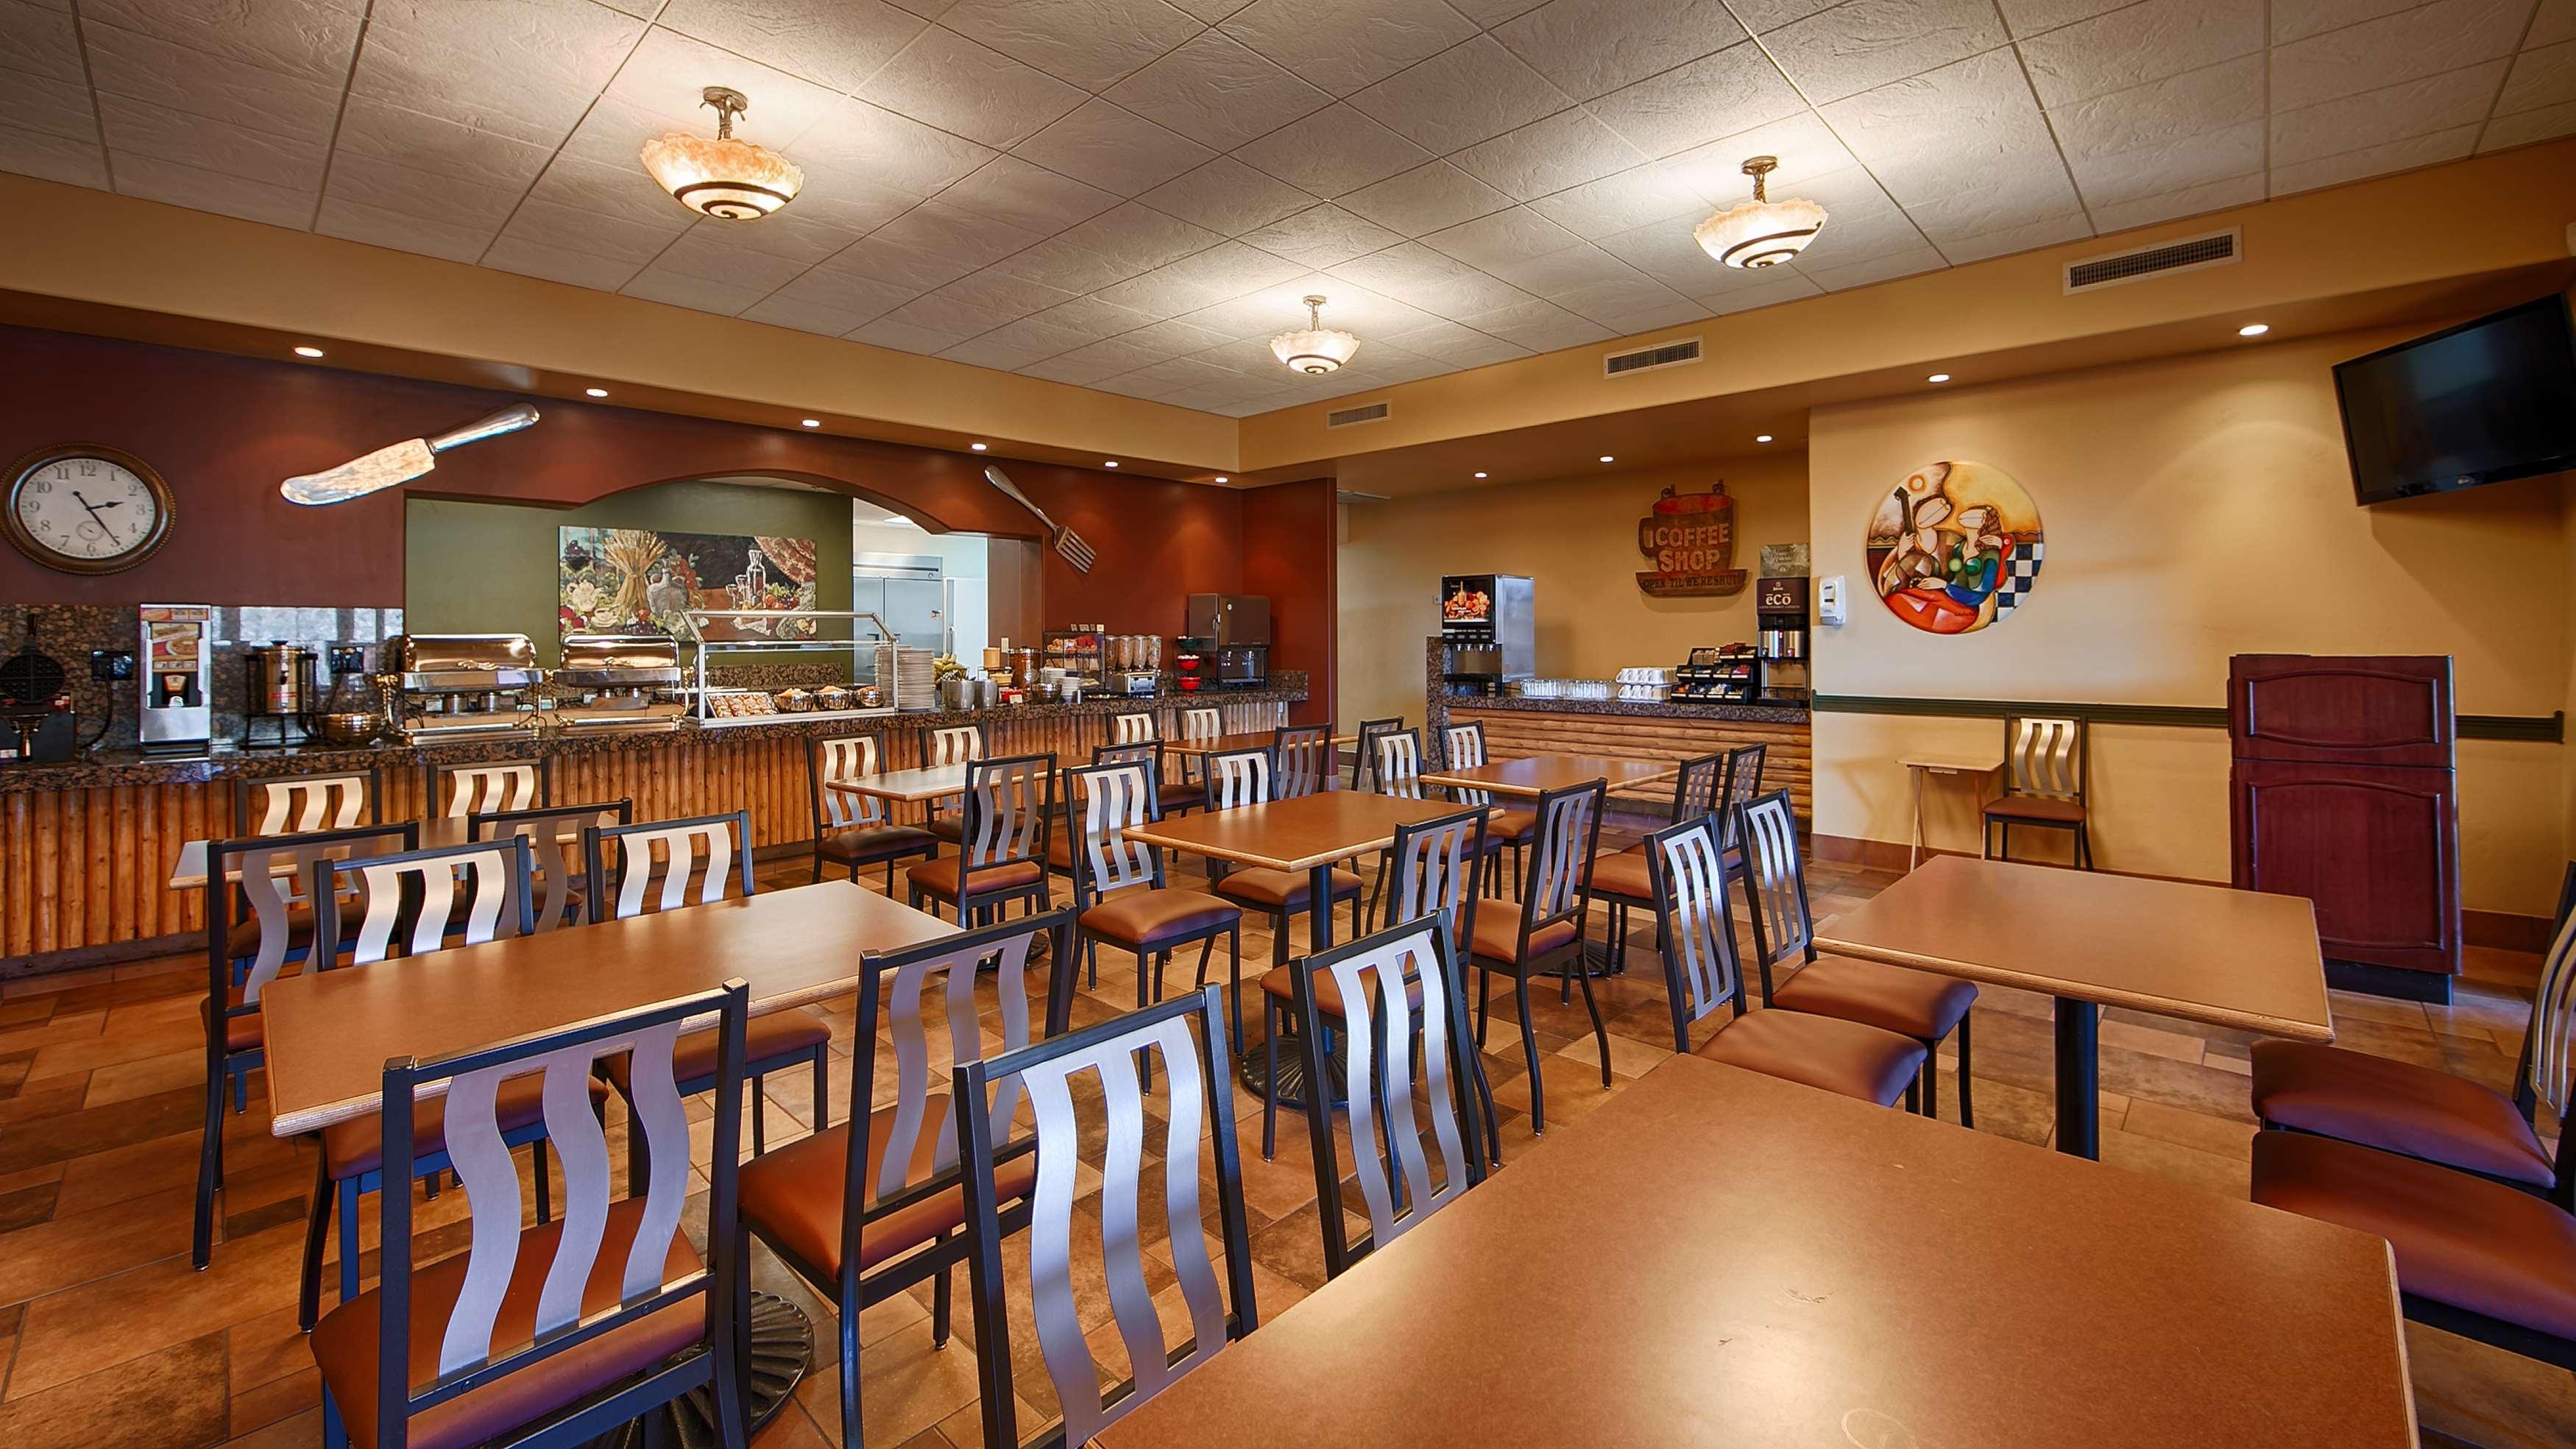 Best Western Plus Arroyo Roble Hotel & Creekside Villas image 9